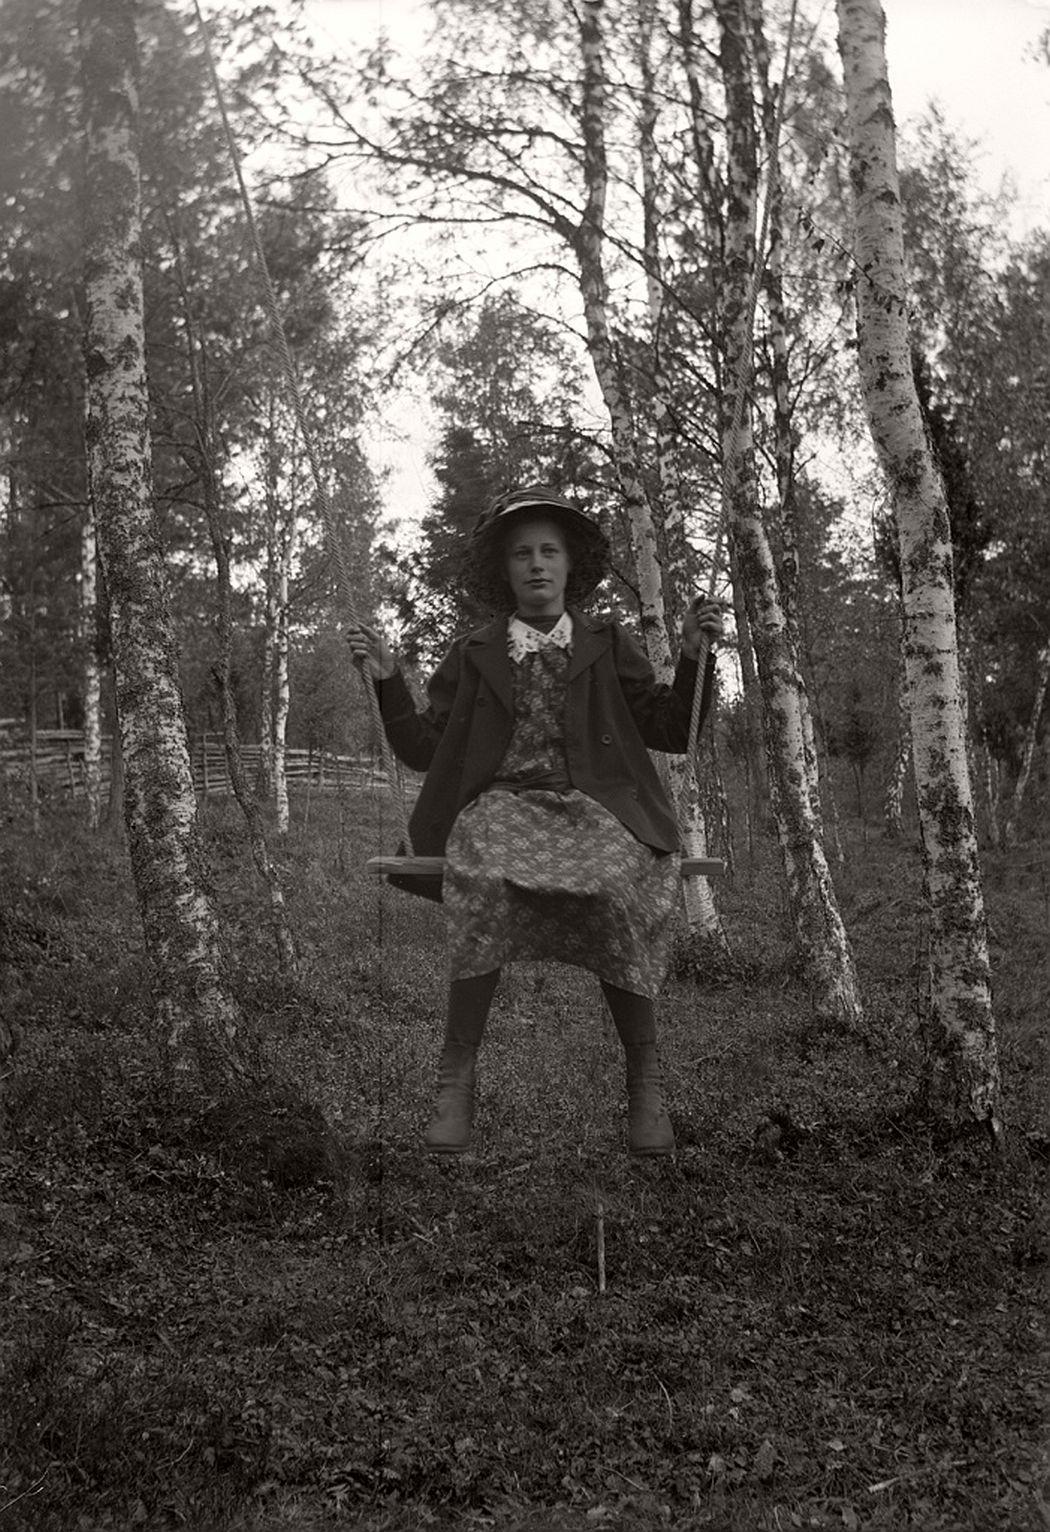 Elin Larsson in the swing, 1914.